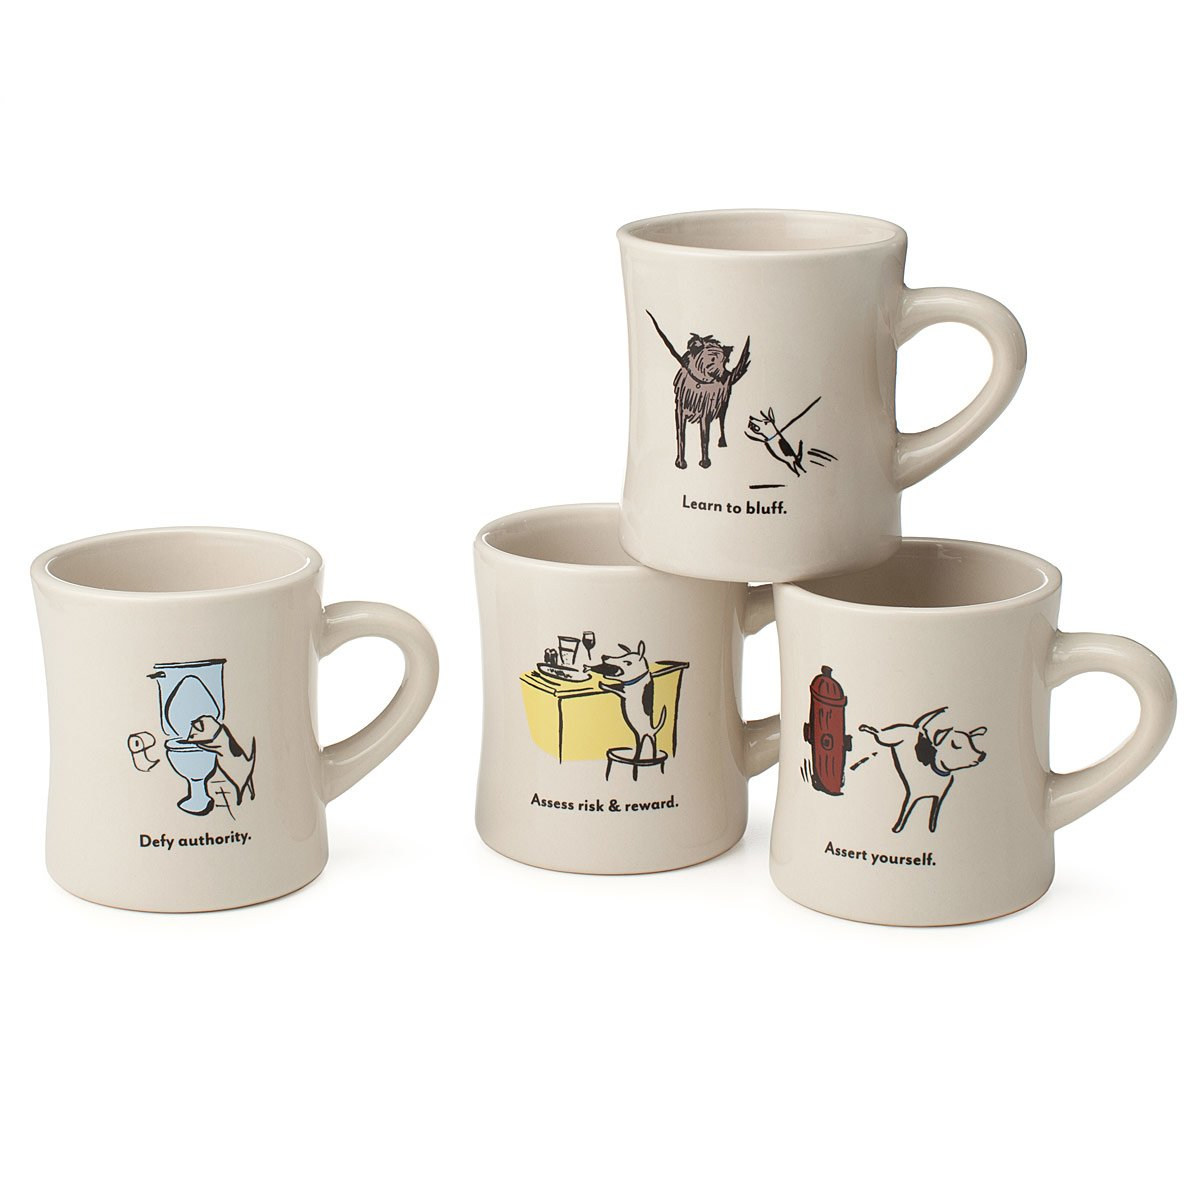 Gallant Coffee Tea Mugs Uncommongoods Coffee Mug Sets Online Coffee Mug Gift Sets Bad Dog Wisdom Diner Mugs Set furniture Coffe Mug Sets